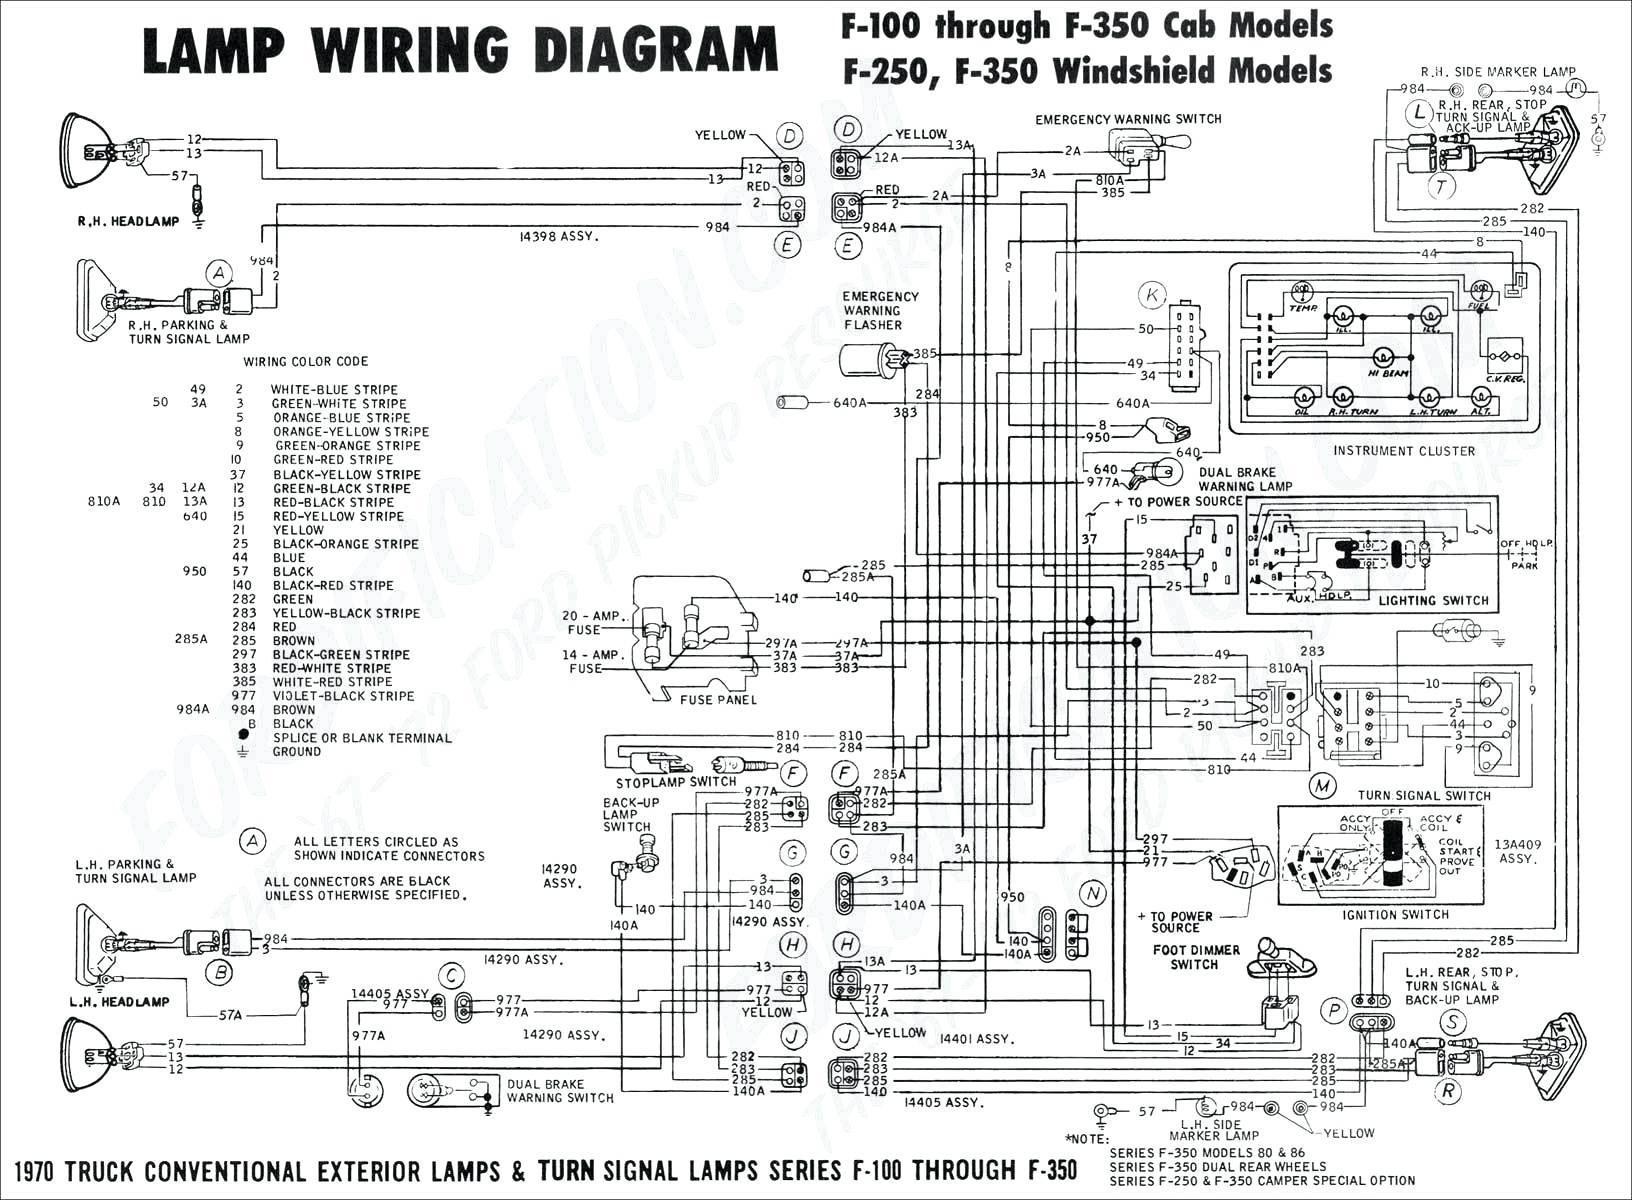 2002 toyota Sienna Engine Diagram F 250 Engine Diagram Layout Wiring Diagrams • Of 2002 toyota Sienna Engine Diagram